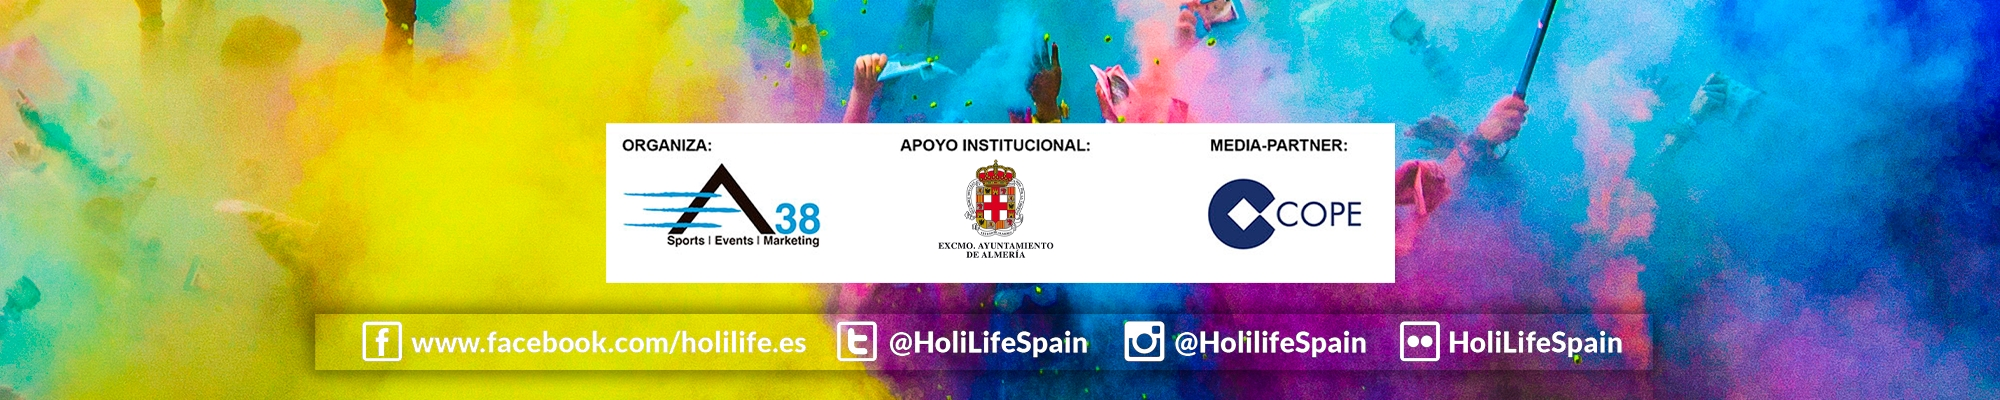 Holi Life Almería 3rd Edition 09-02-2020